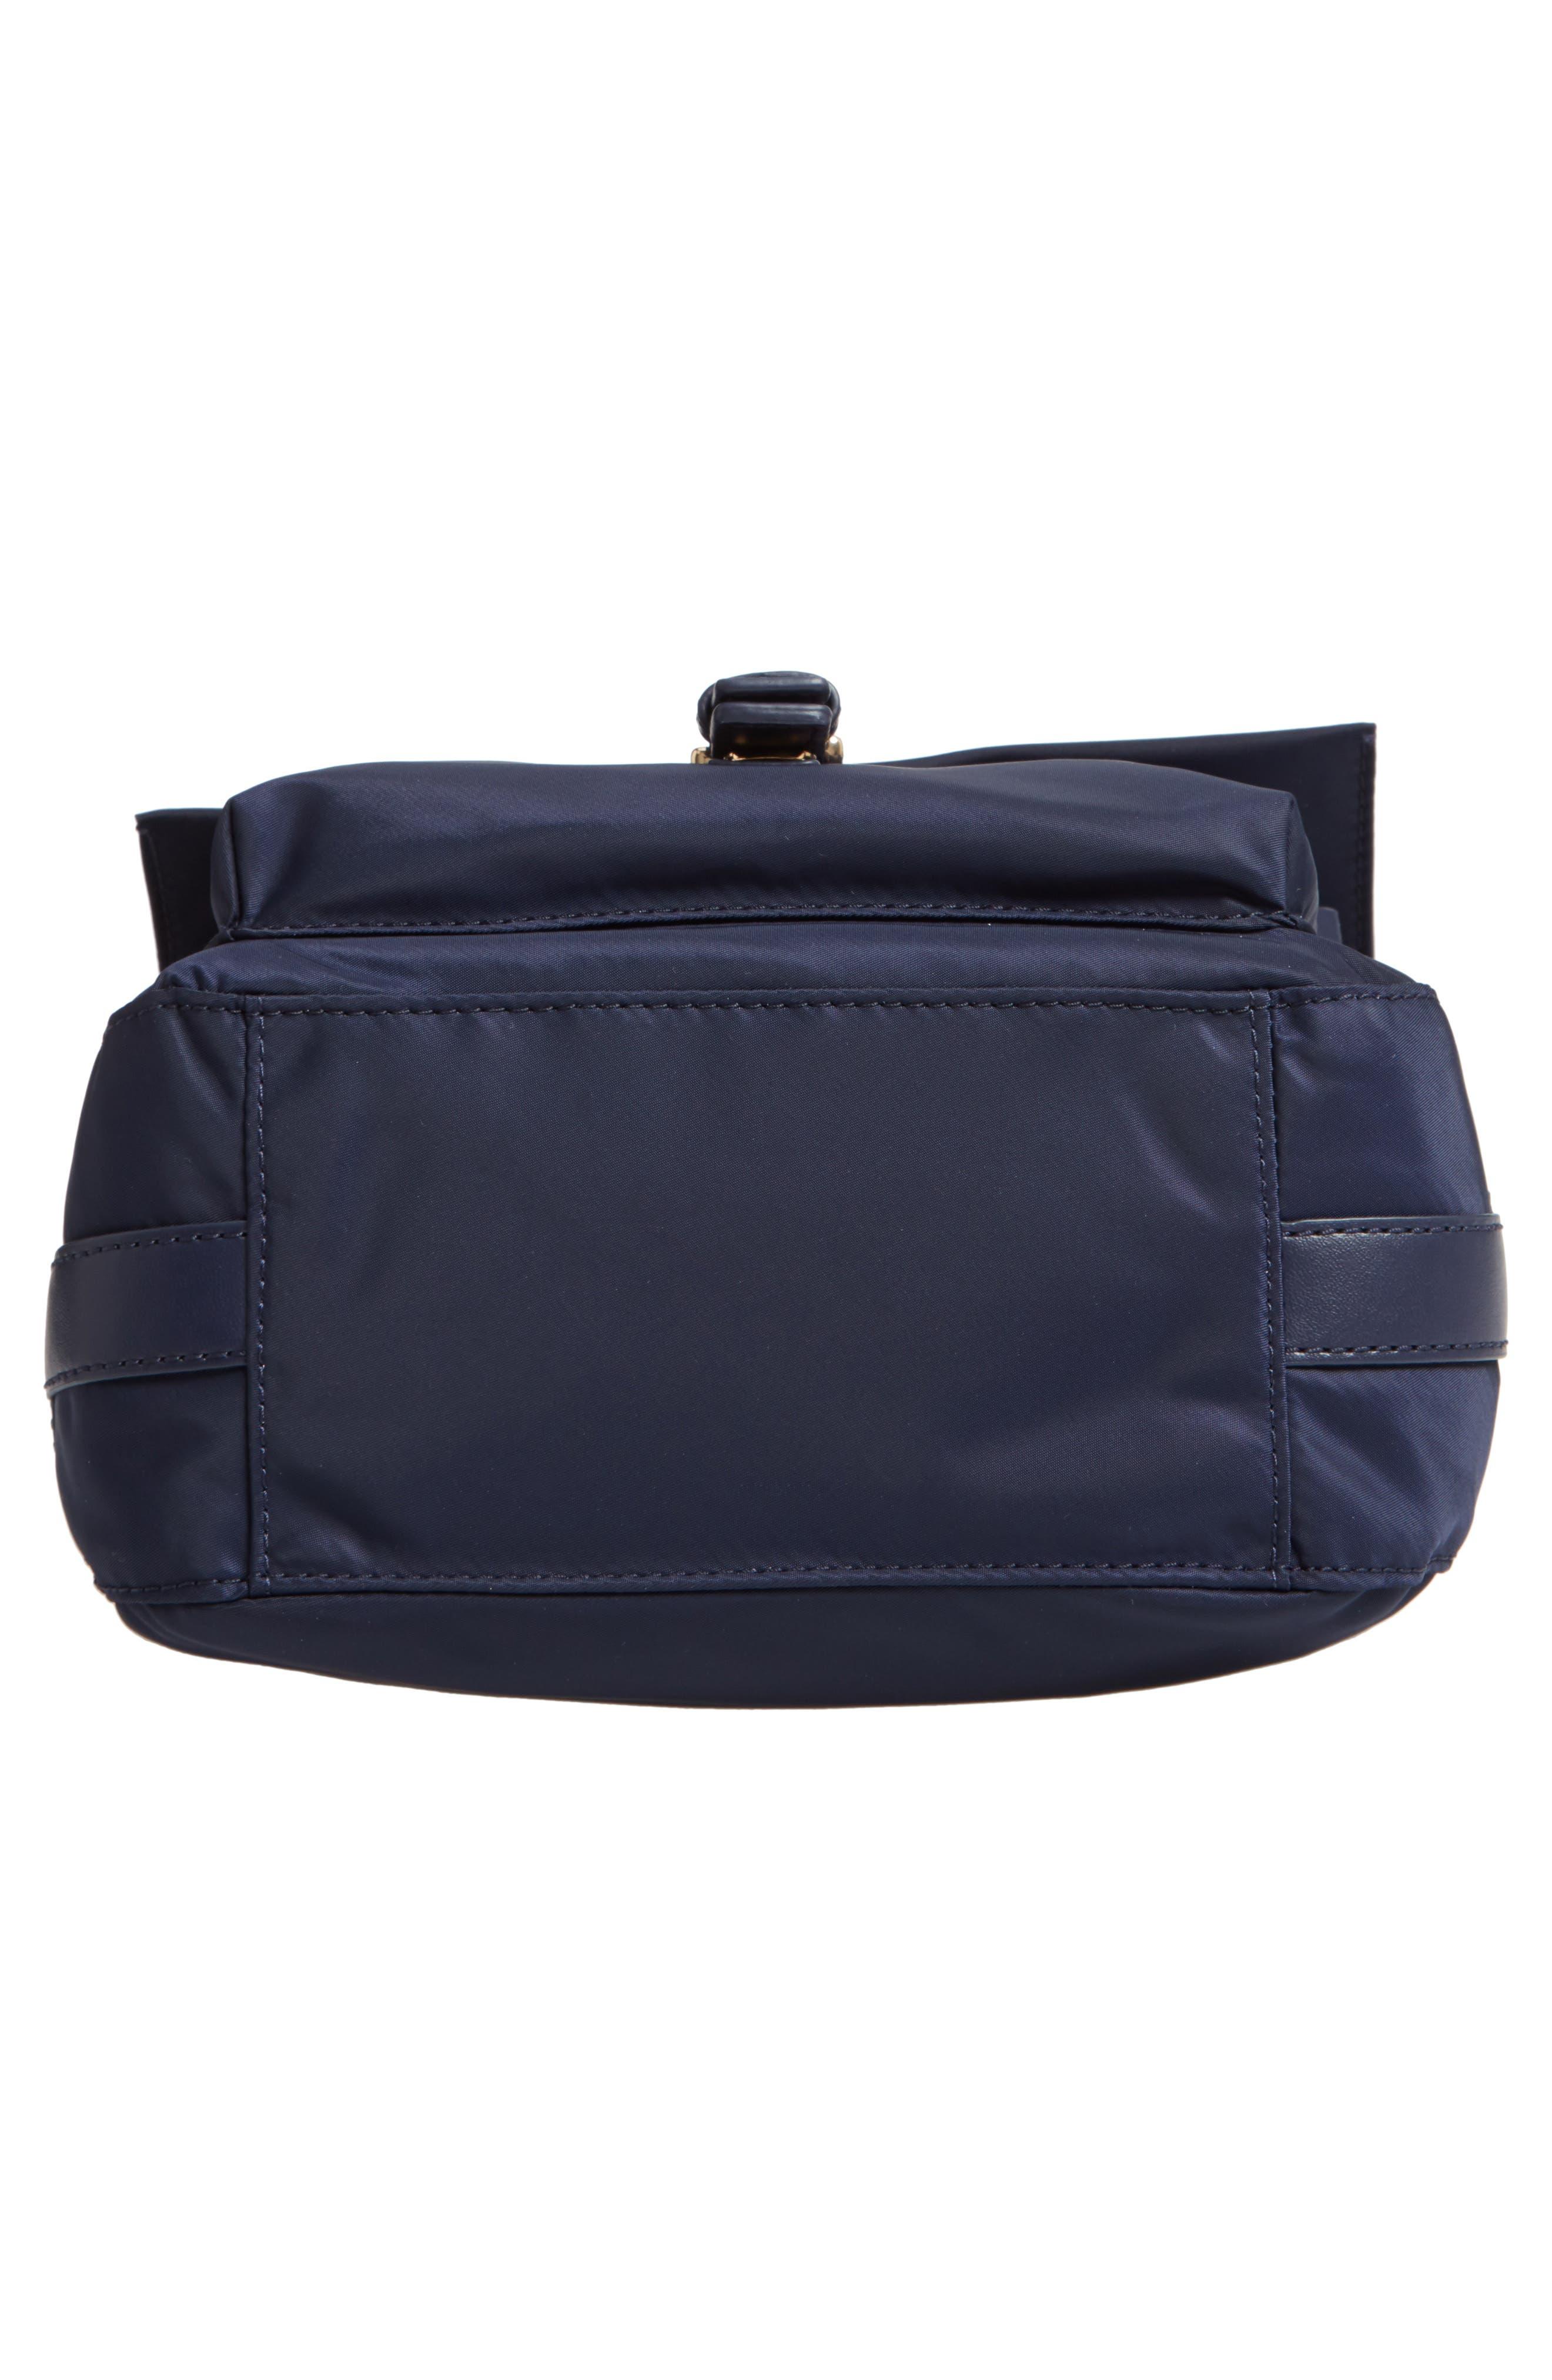 Tilda Nylon Crossbody Bag,                             Alternate thumbnail 7, color,                             400